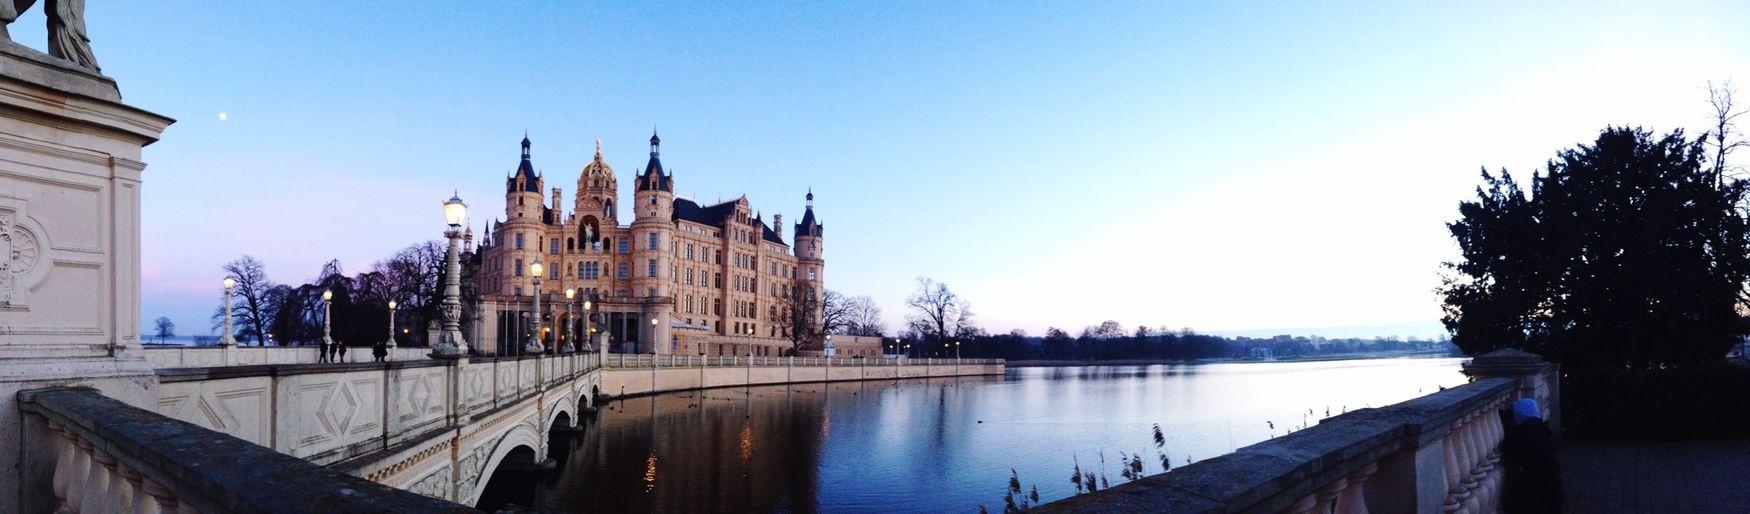 Castle in Schwerin Taking Photos